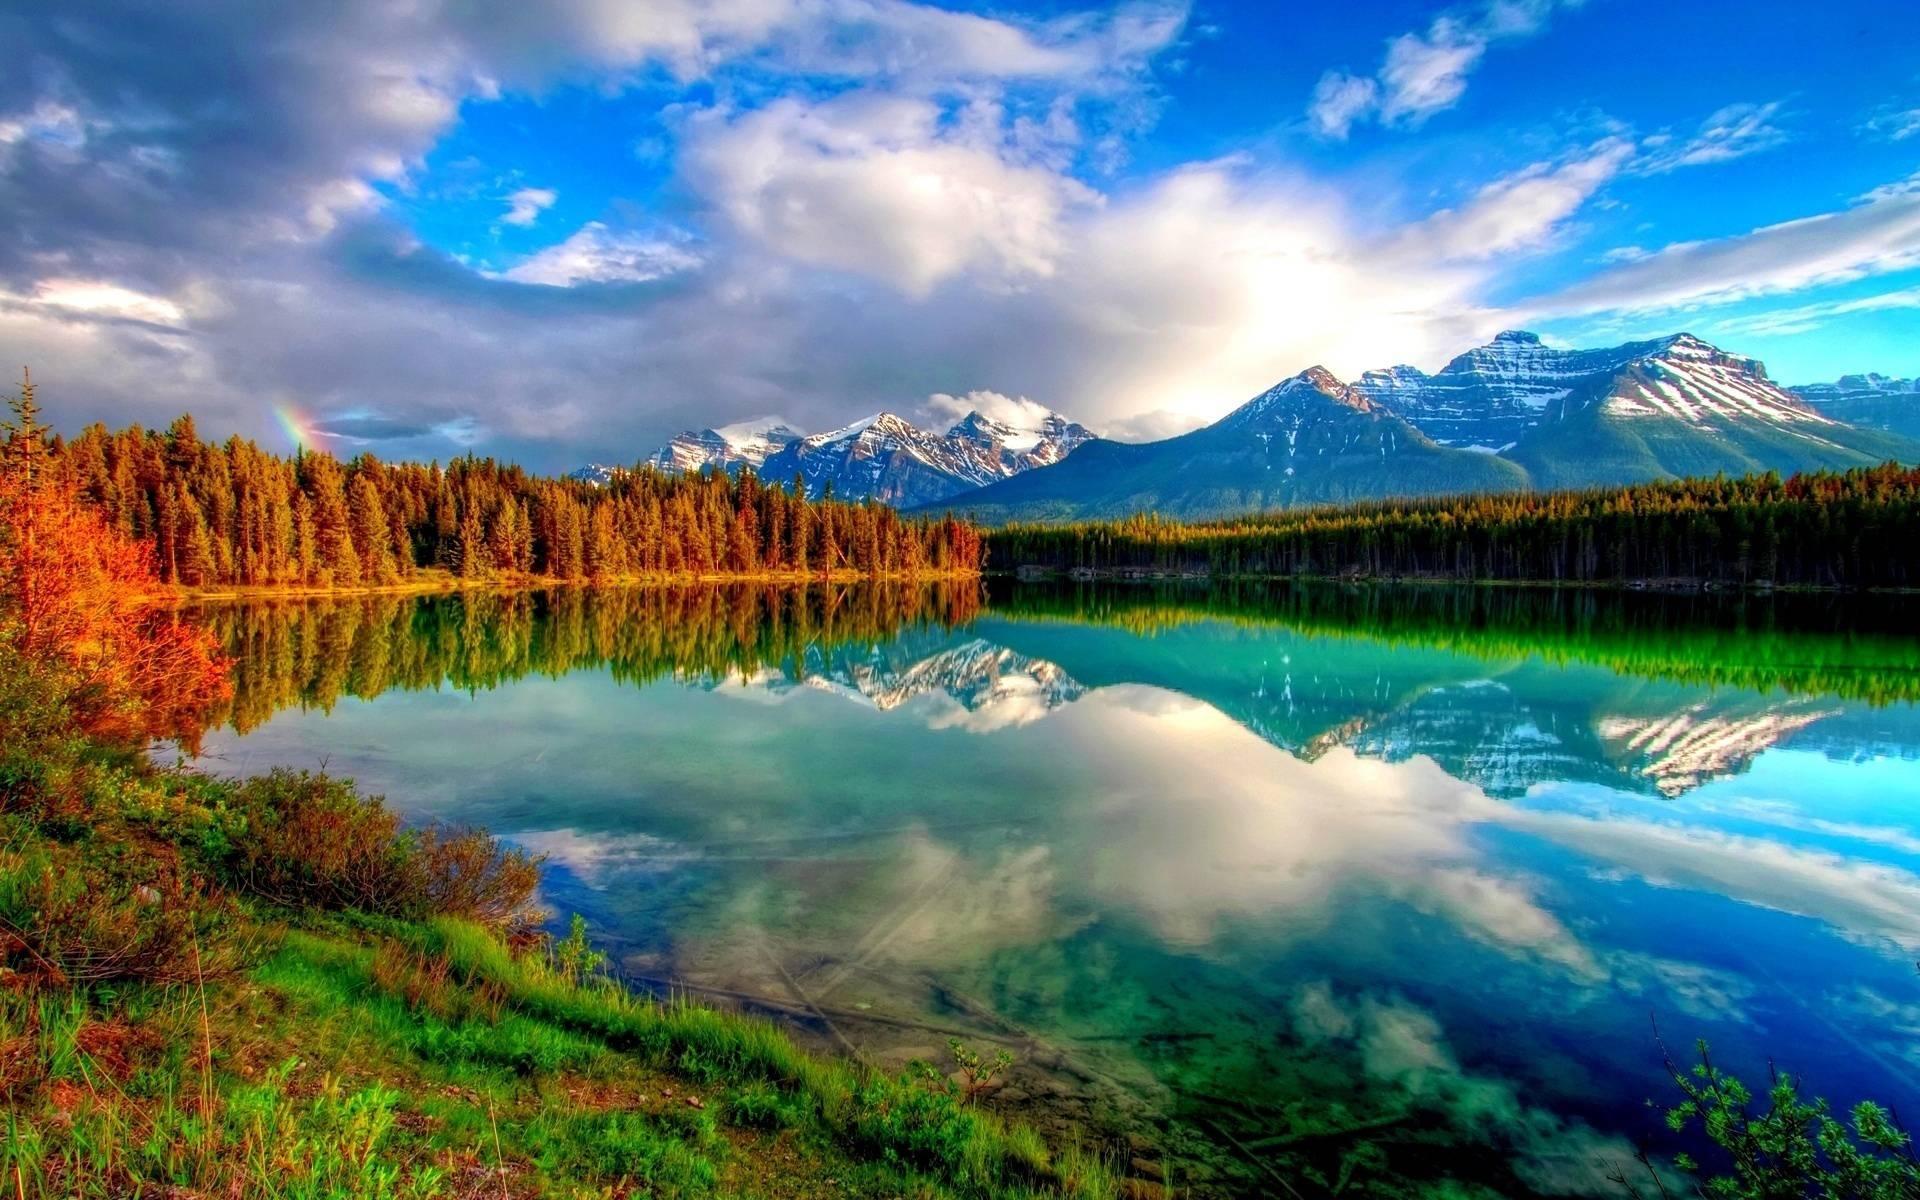 Natures Coolest Water Slide